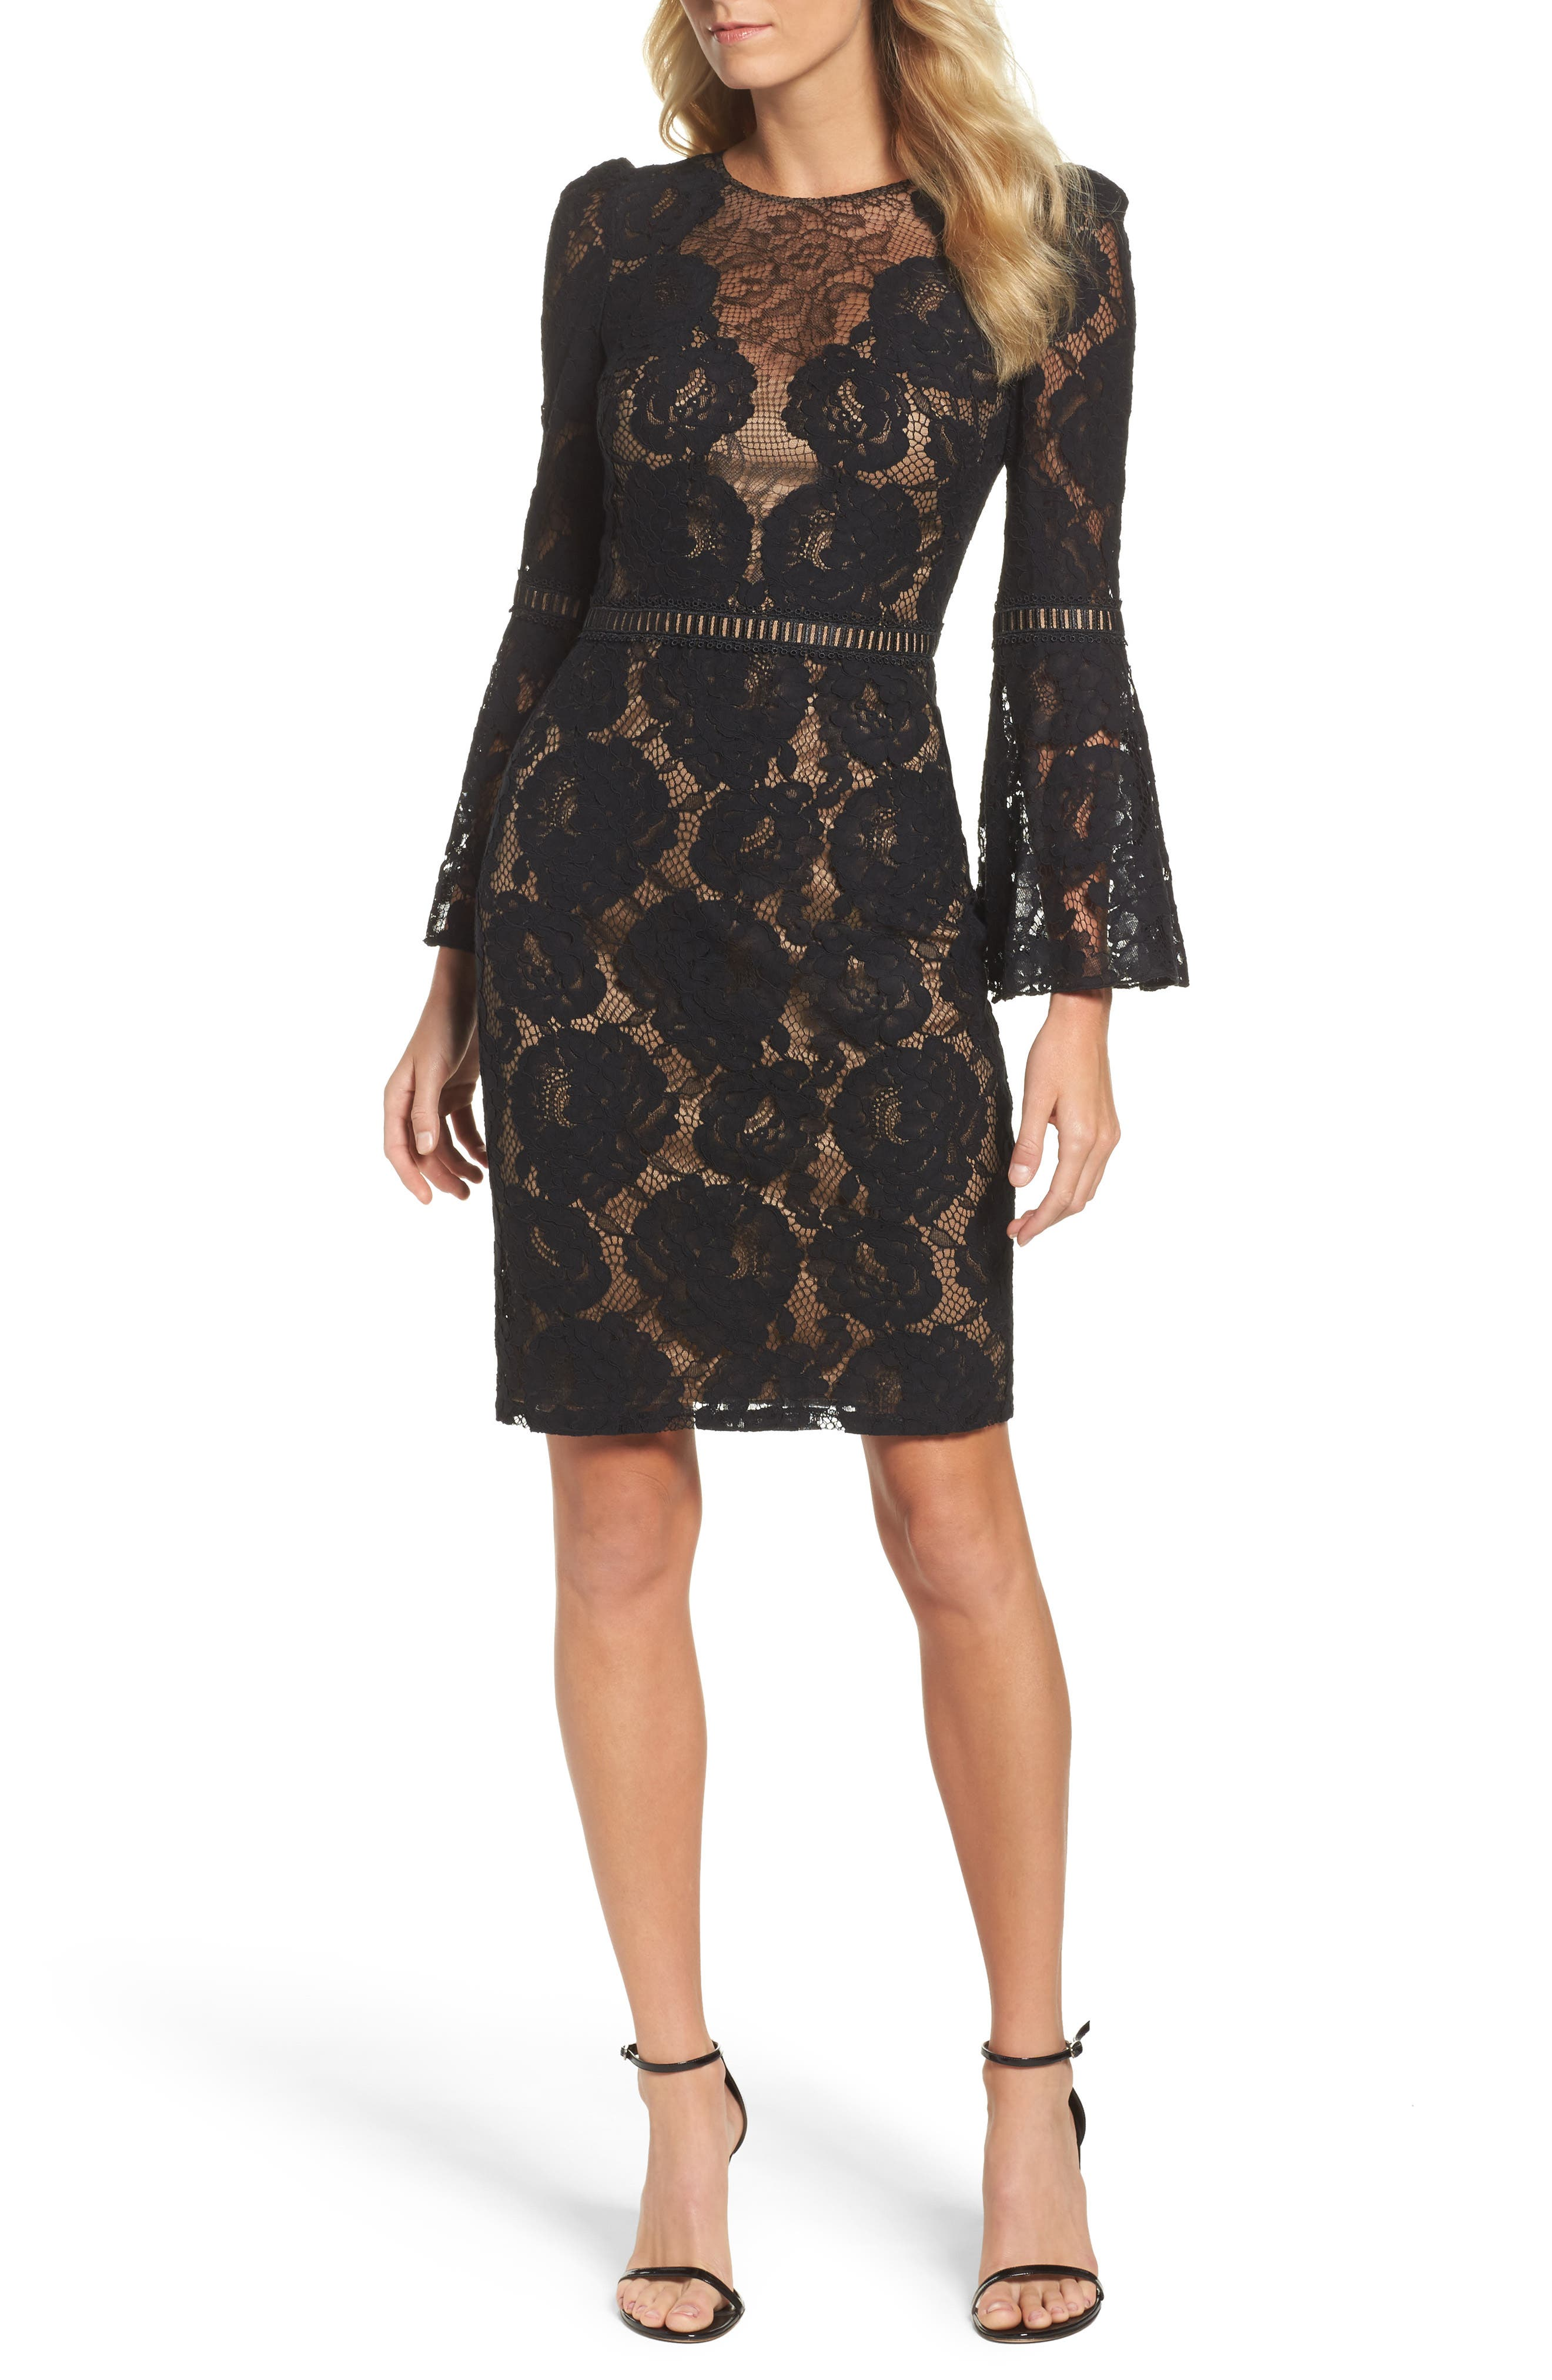 Alternate Image 1 Selected - Tadashi Shoji Lace Bell Sleeve Dress